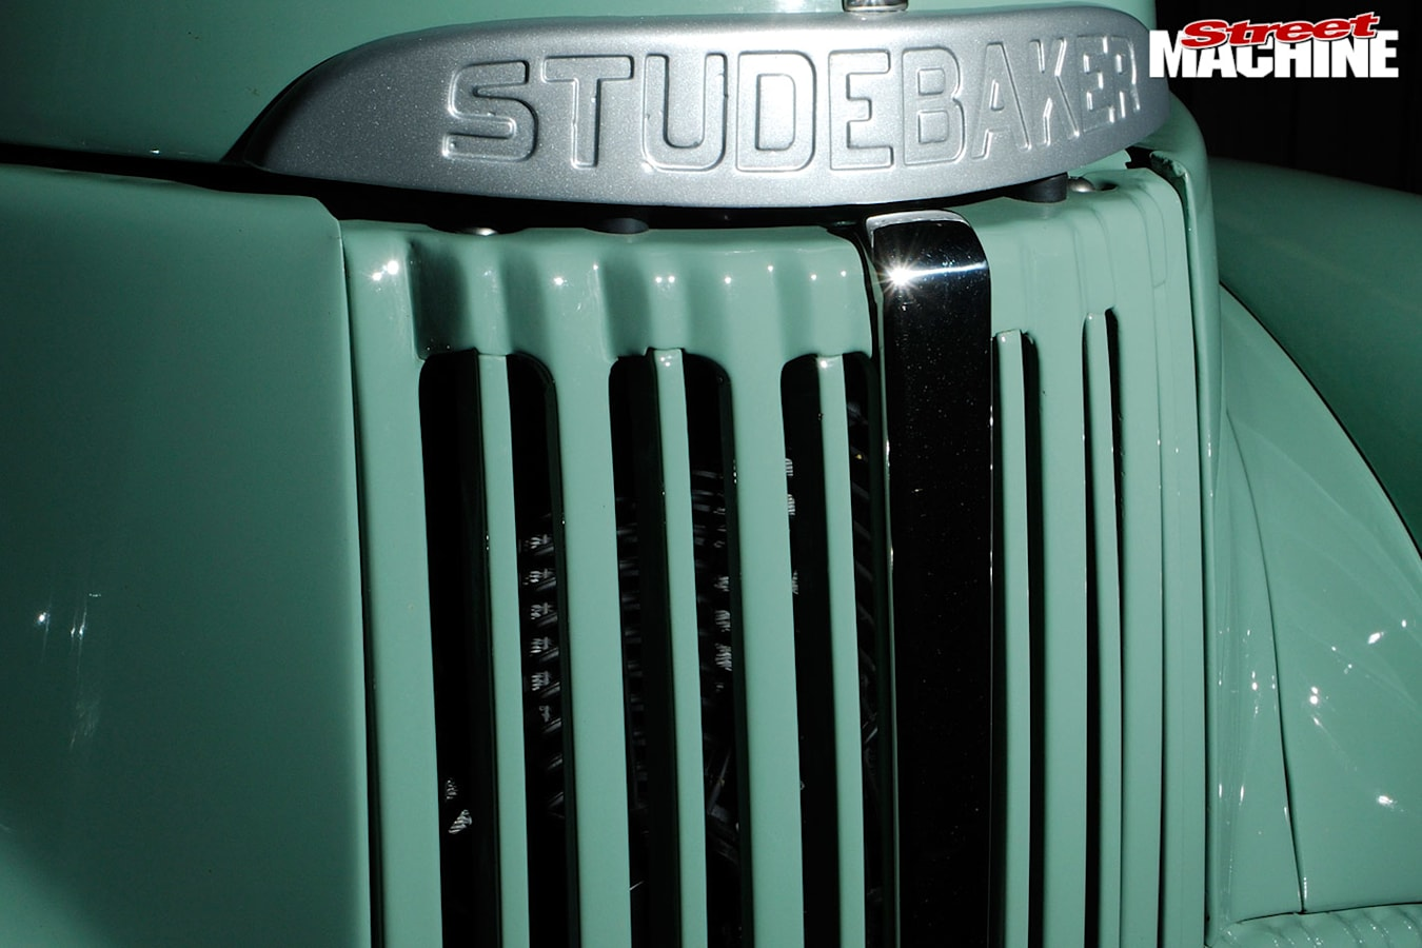 1948 Studebaker M5 pickup grille